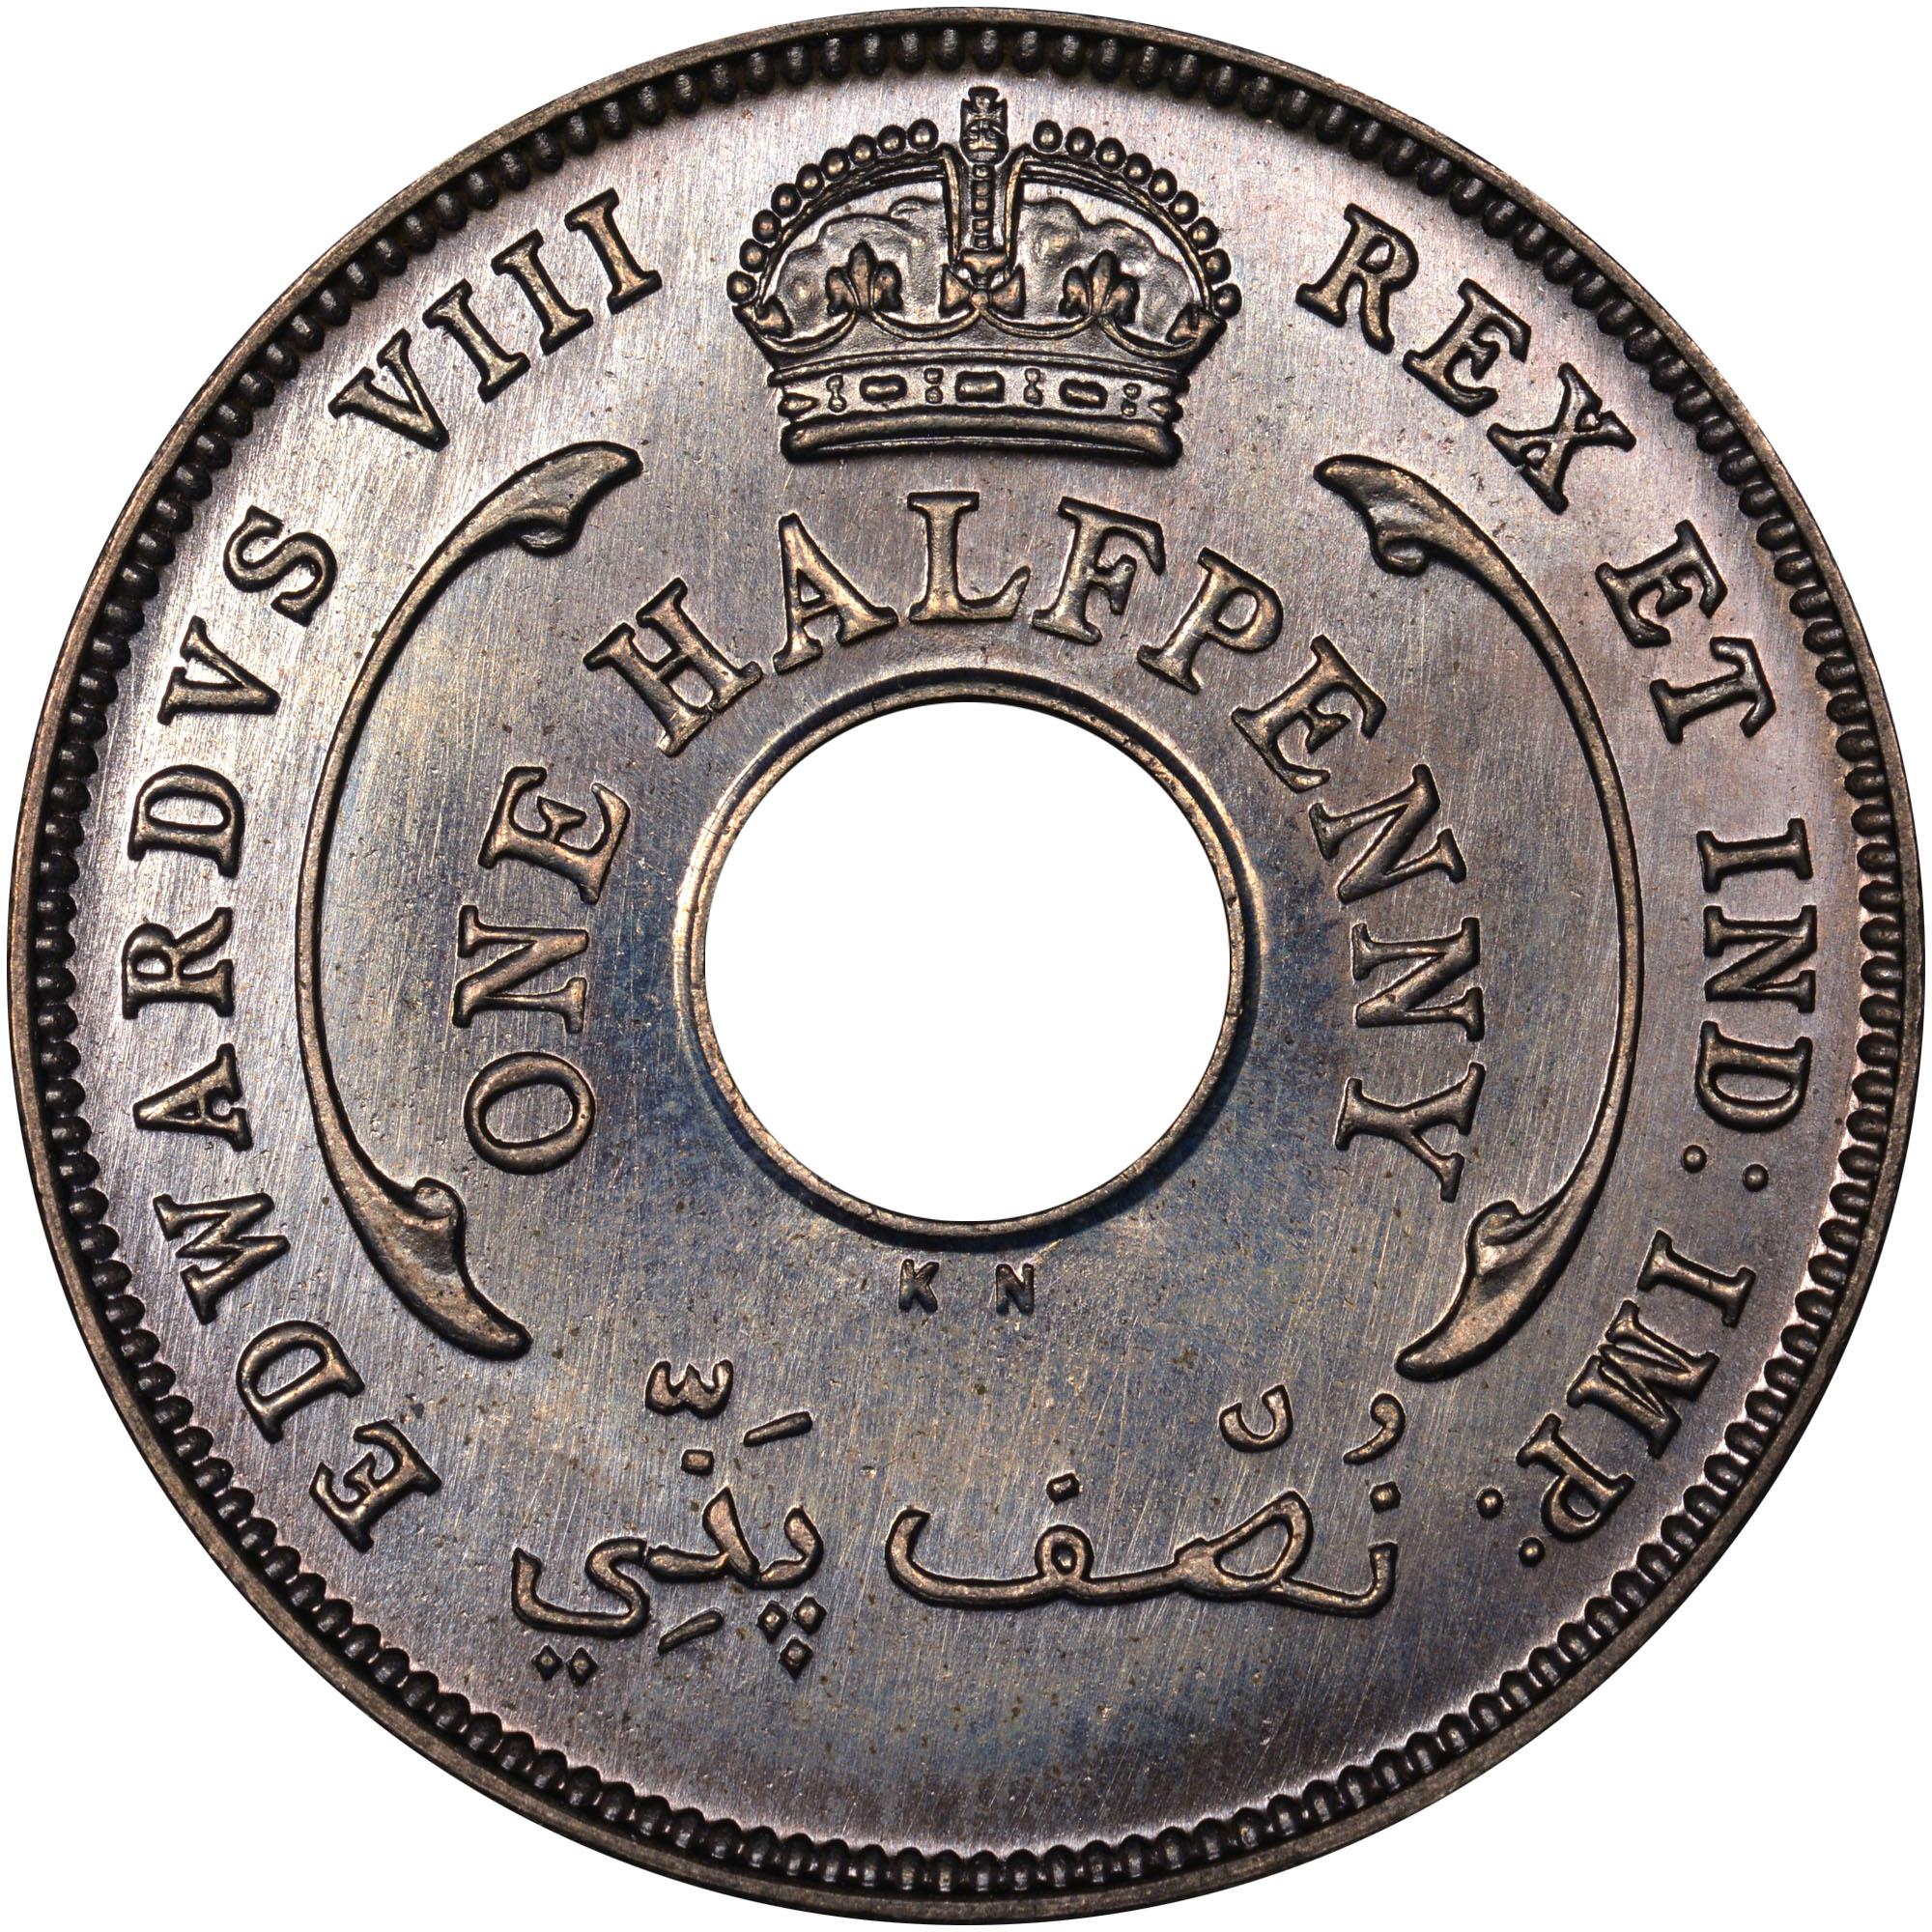 British West Africa 1/2 Penny obverse